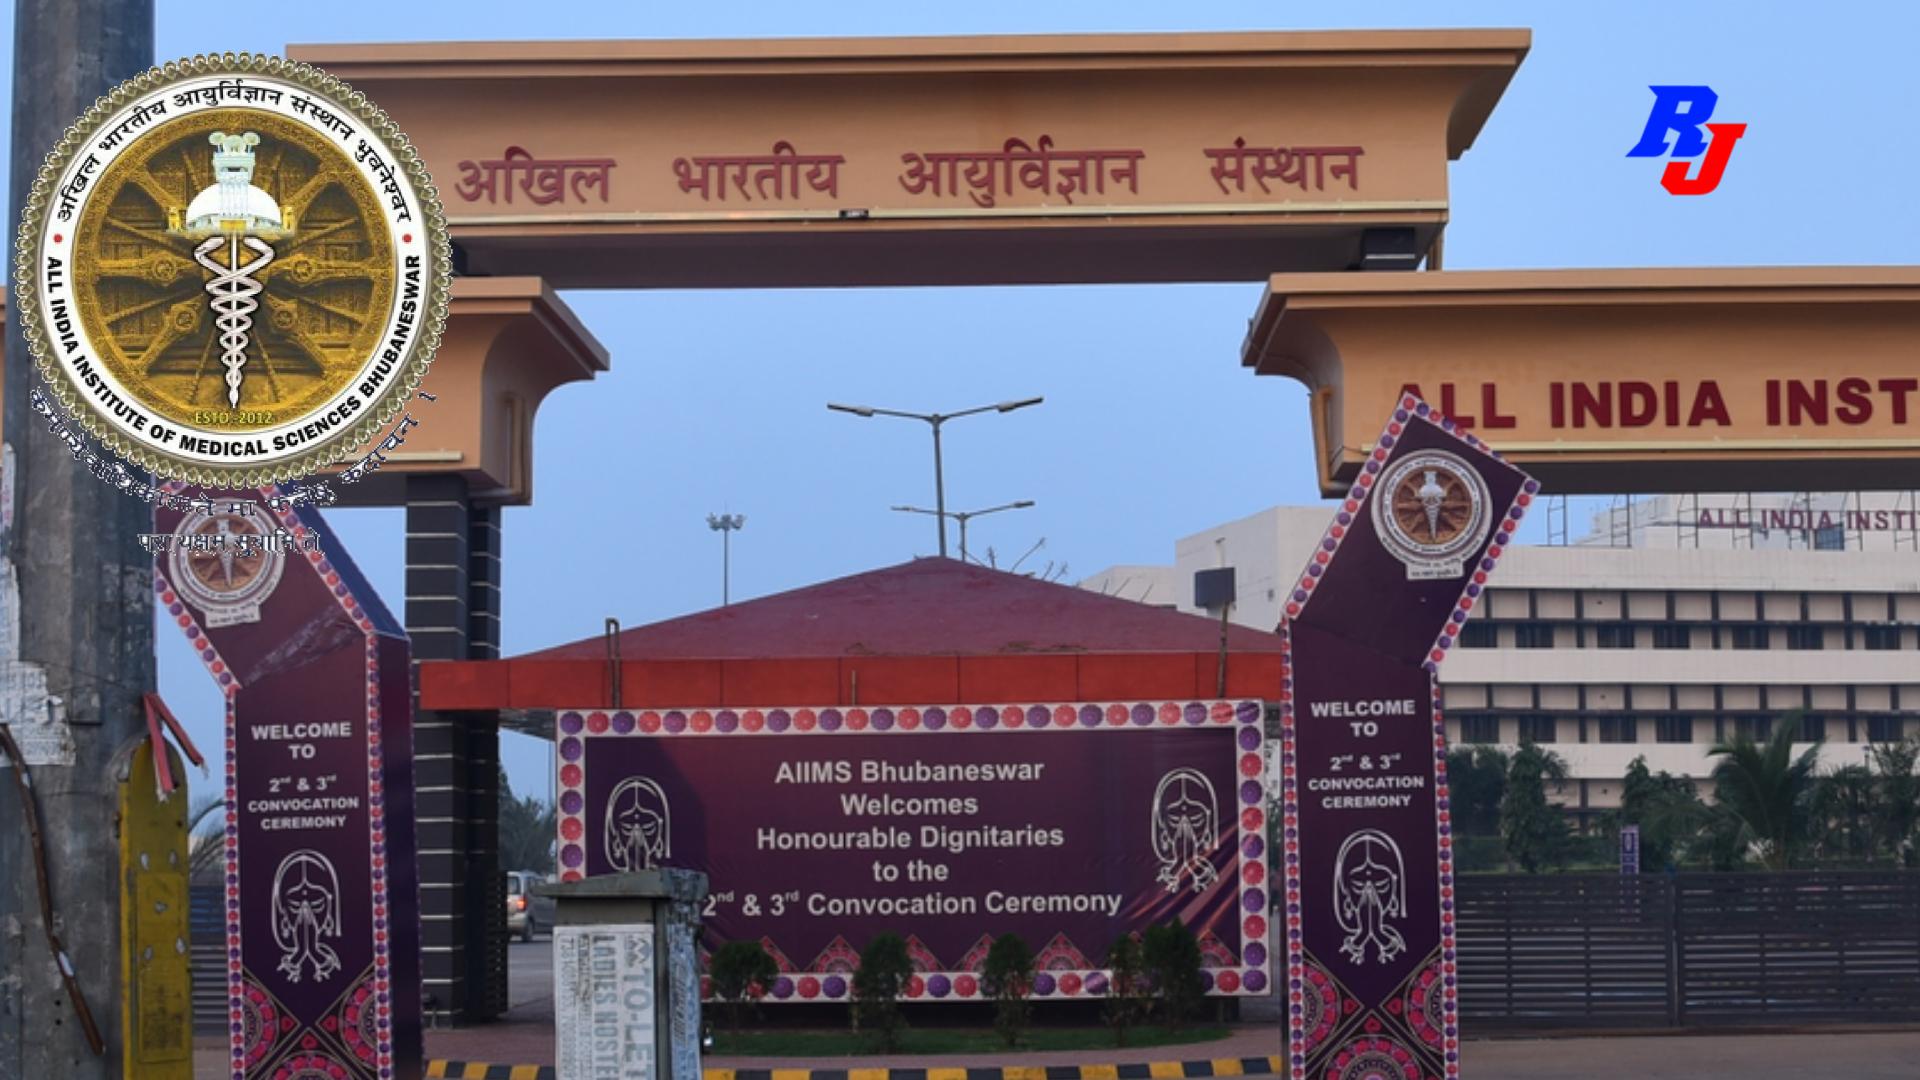 Scientist-C (Walk-In–interview) Post AIIMS, Bhubaneswar, Odisha, India